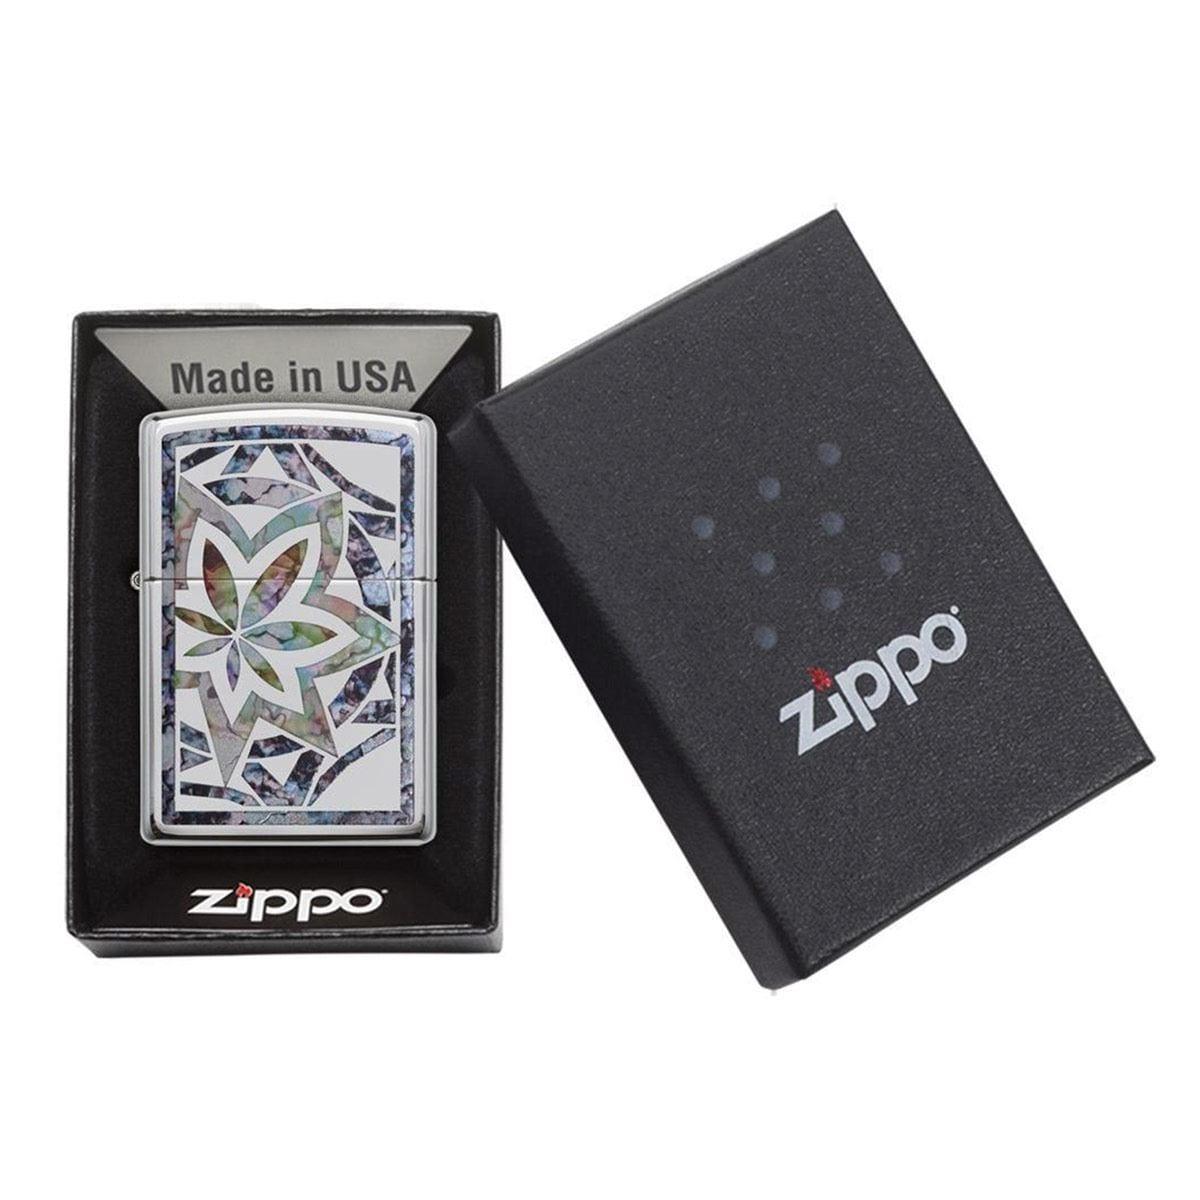 Encendedor Zippo hoja de colores